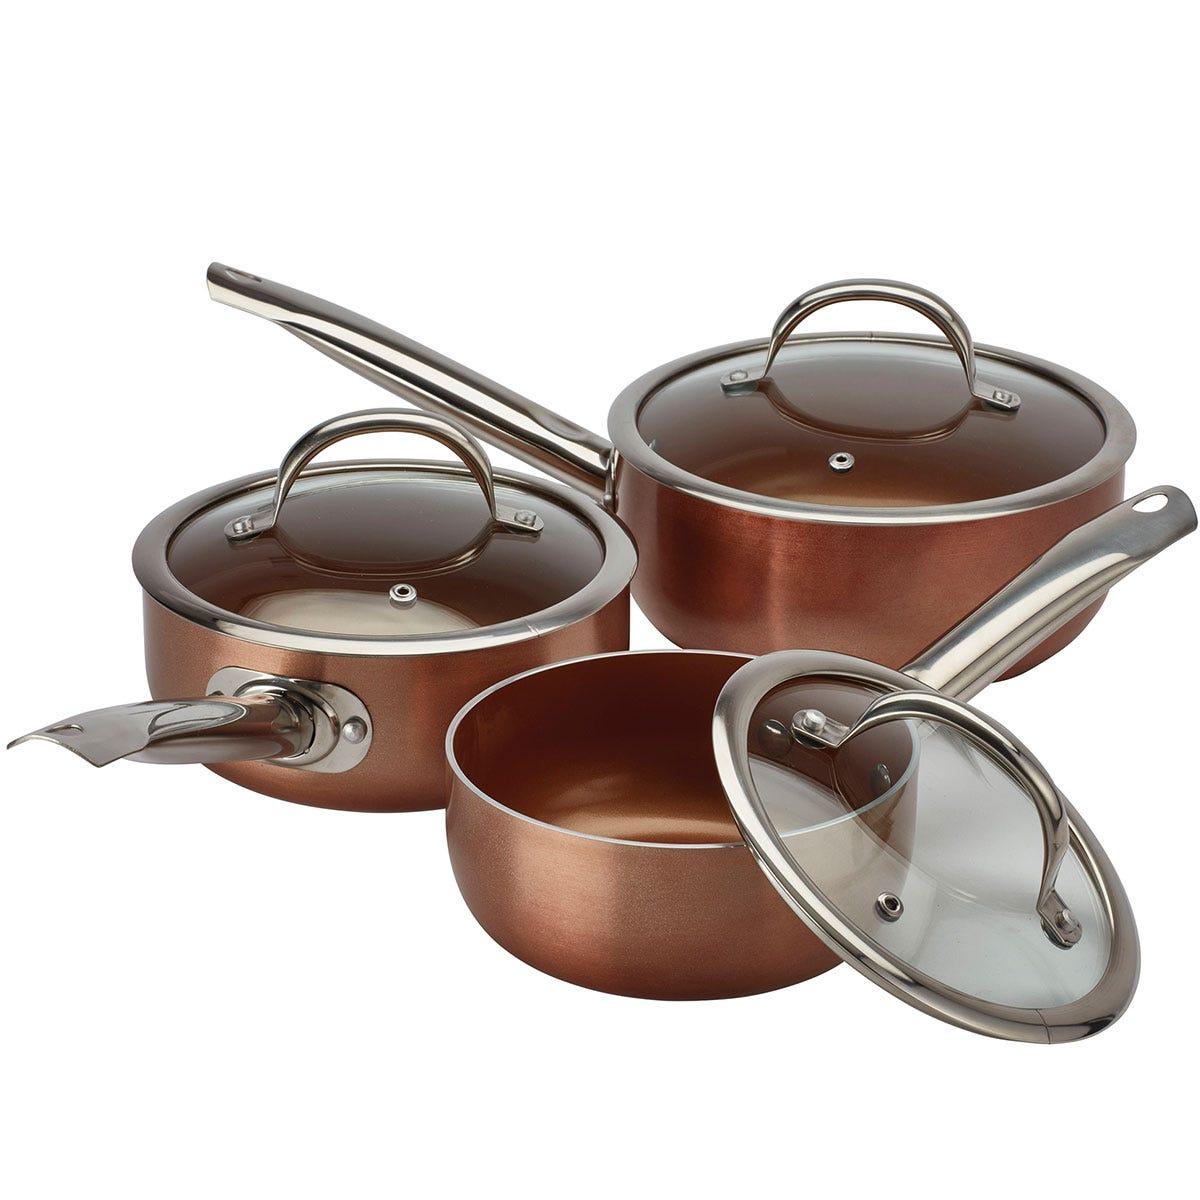 Cooks Professional 3-Piece Non-Stick Saucepan Set - Copper